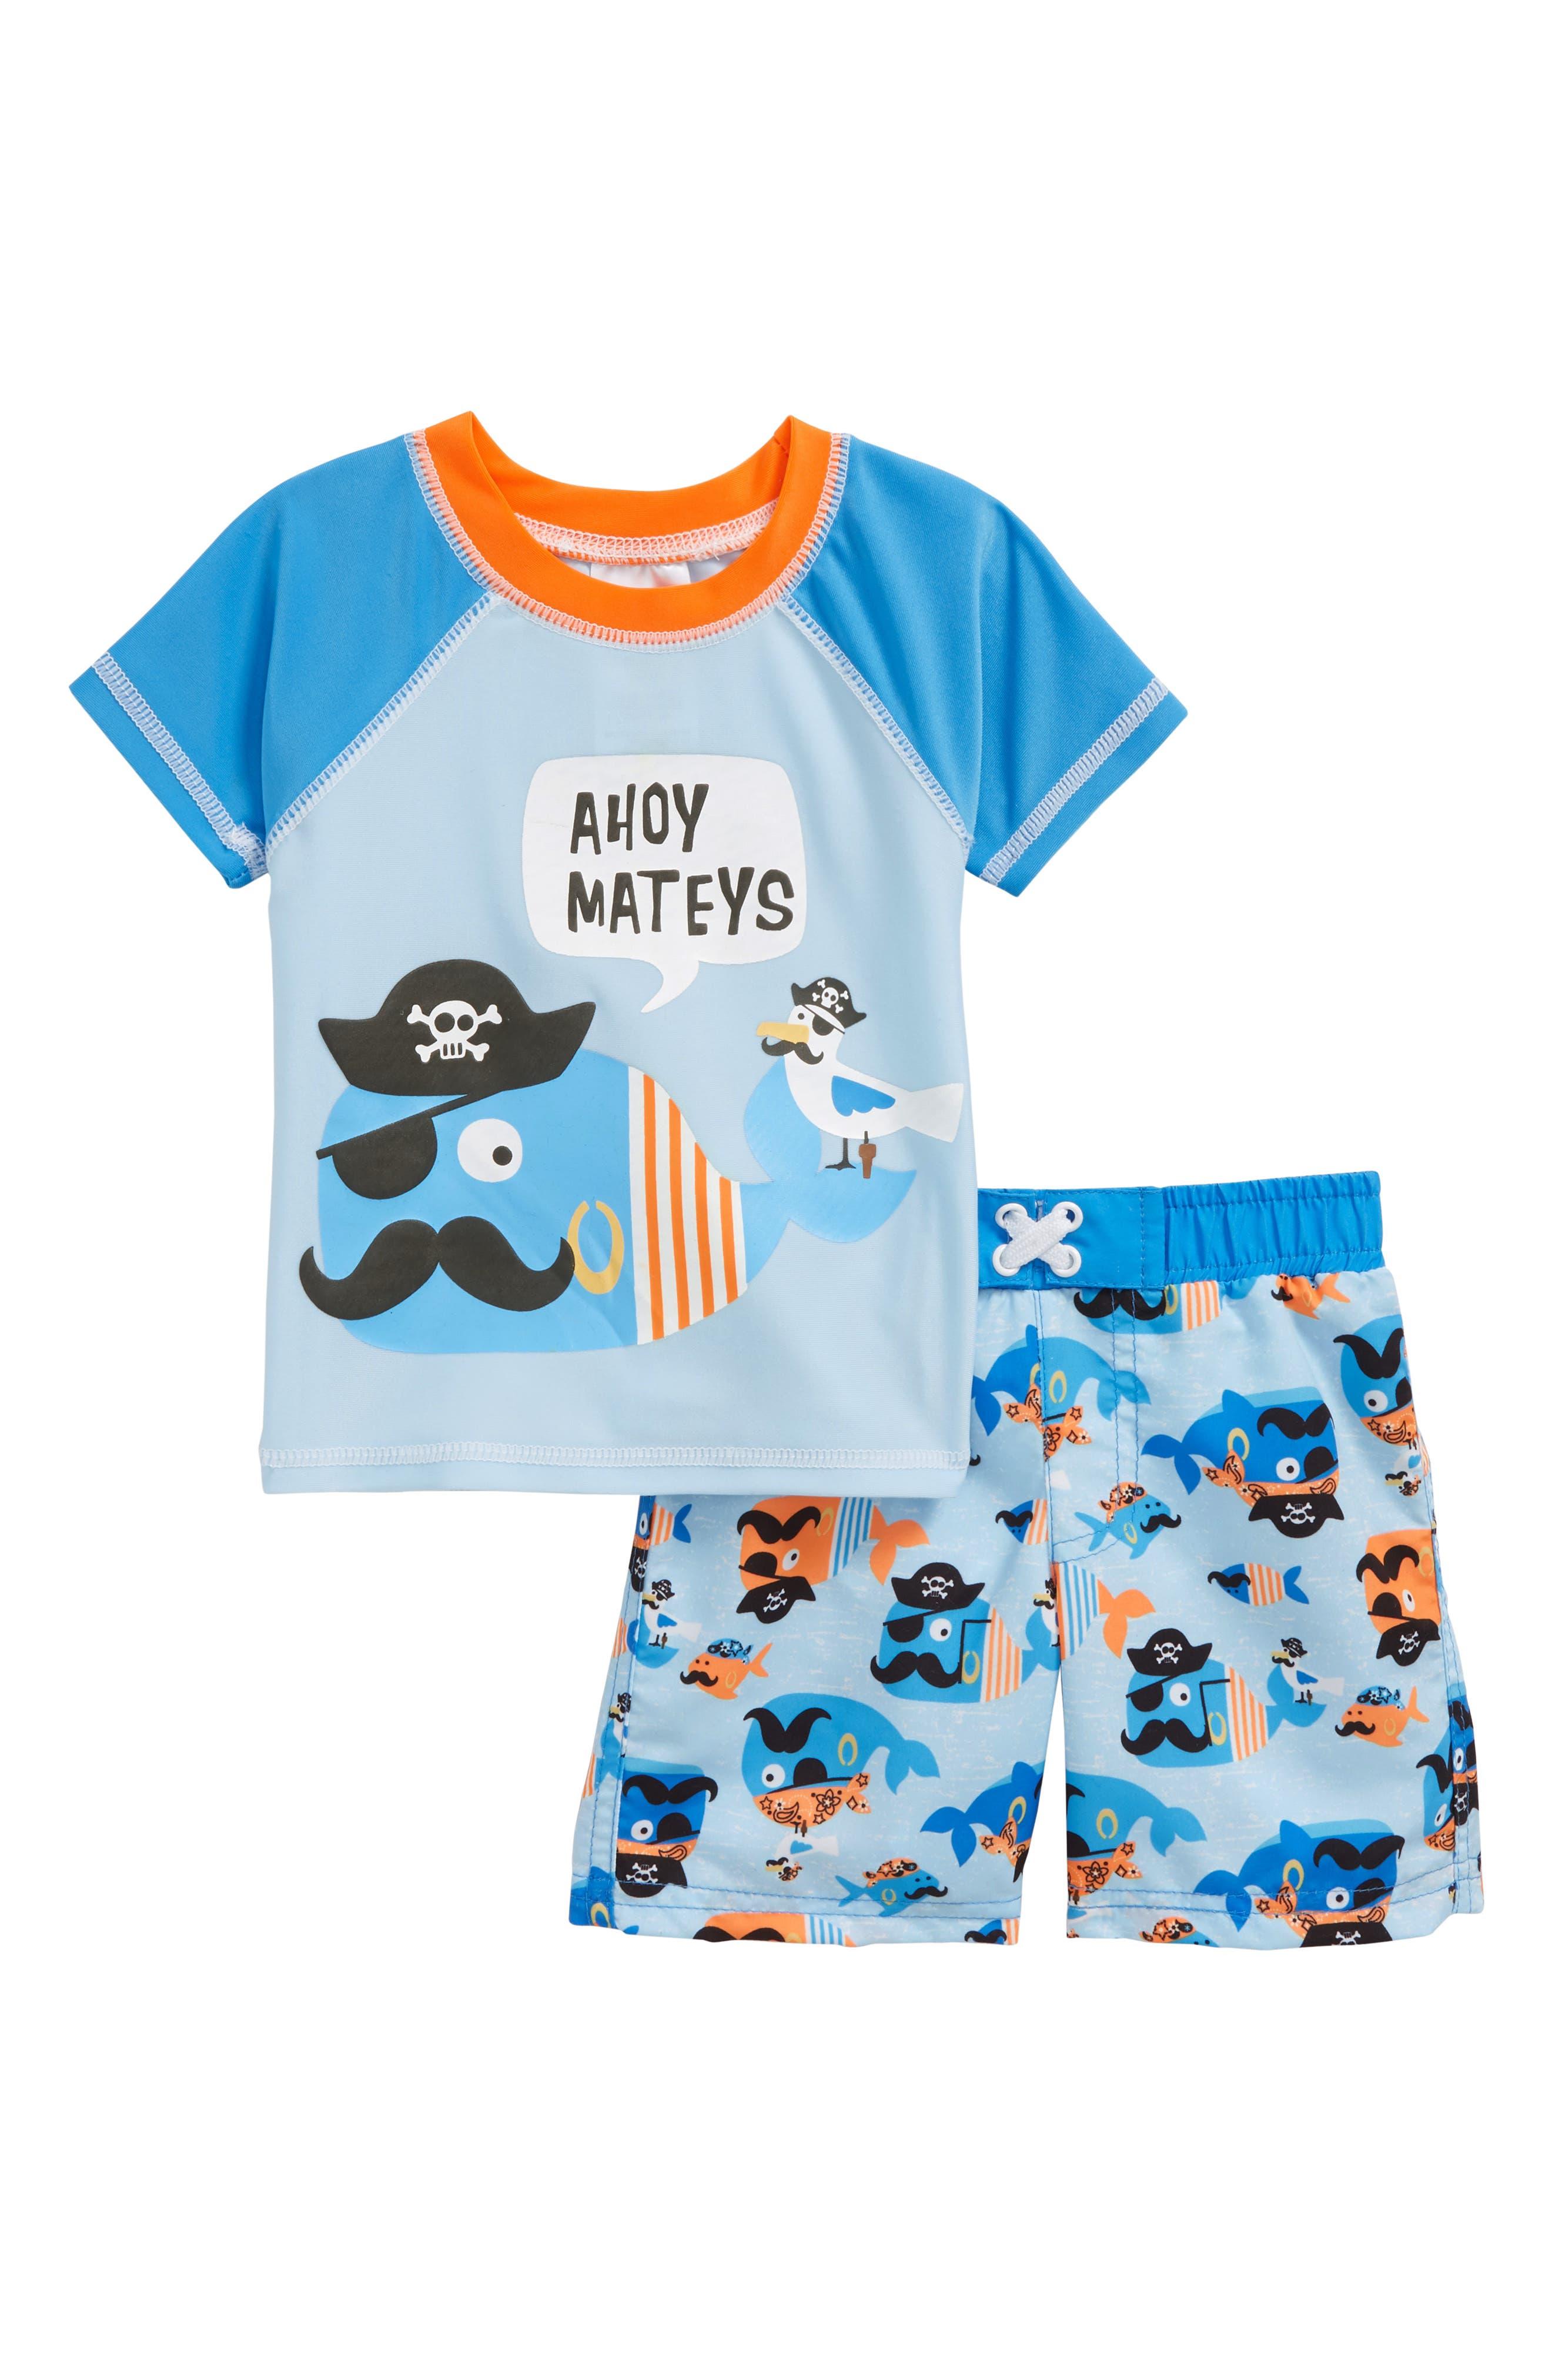 Ahoy Mateys Two-Piece Rashguard Swimsuit,                             Main thumbnail 1, color,                             499